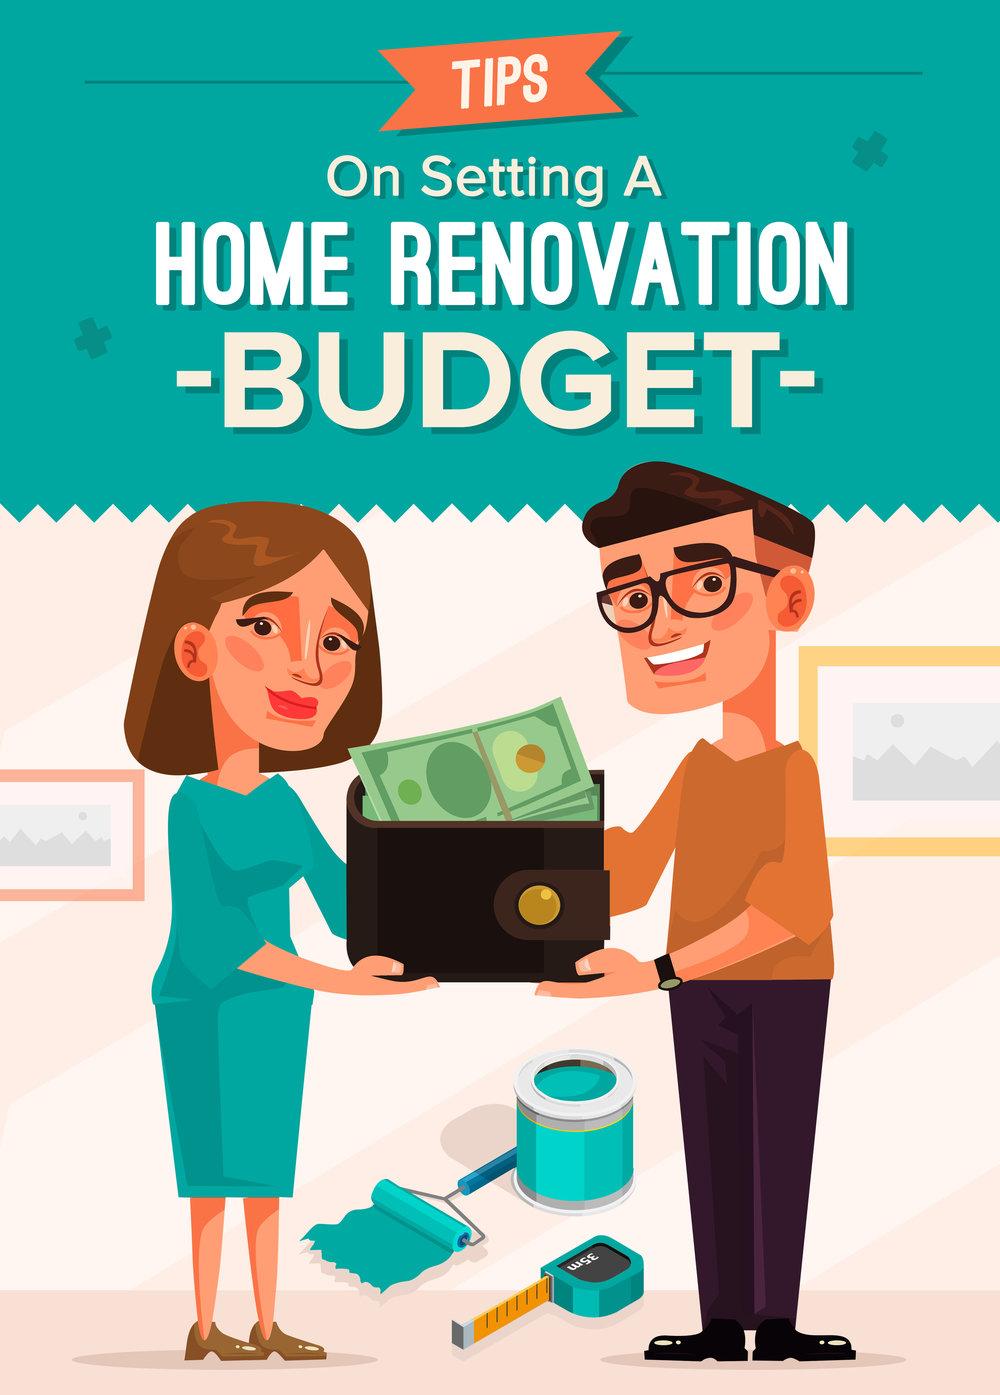 8 Tips On Setting A Home Renovation Budget.jpg